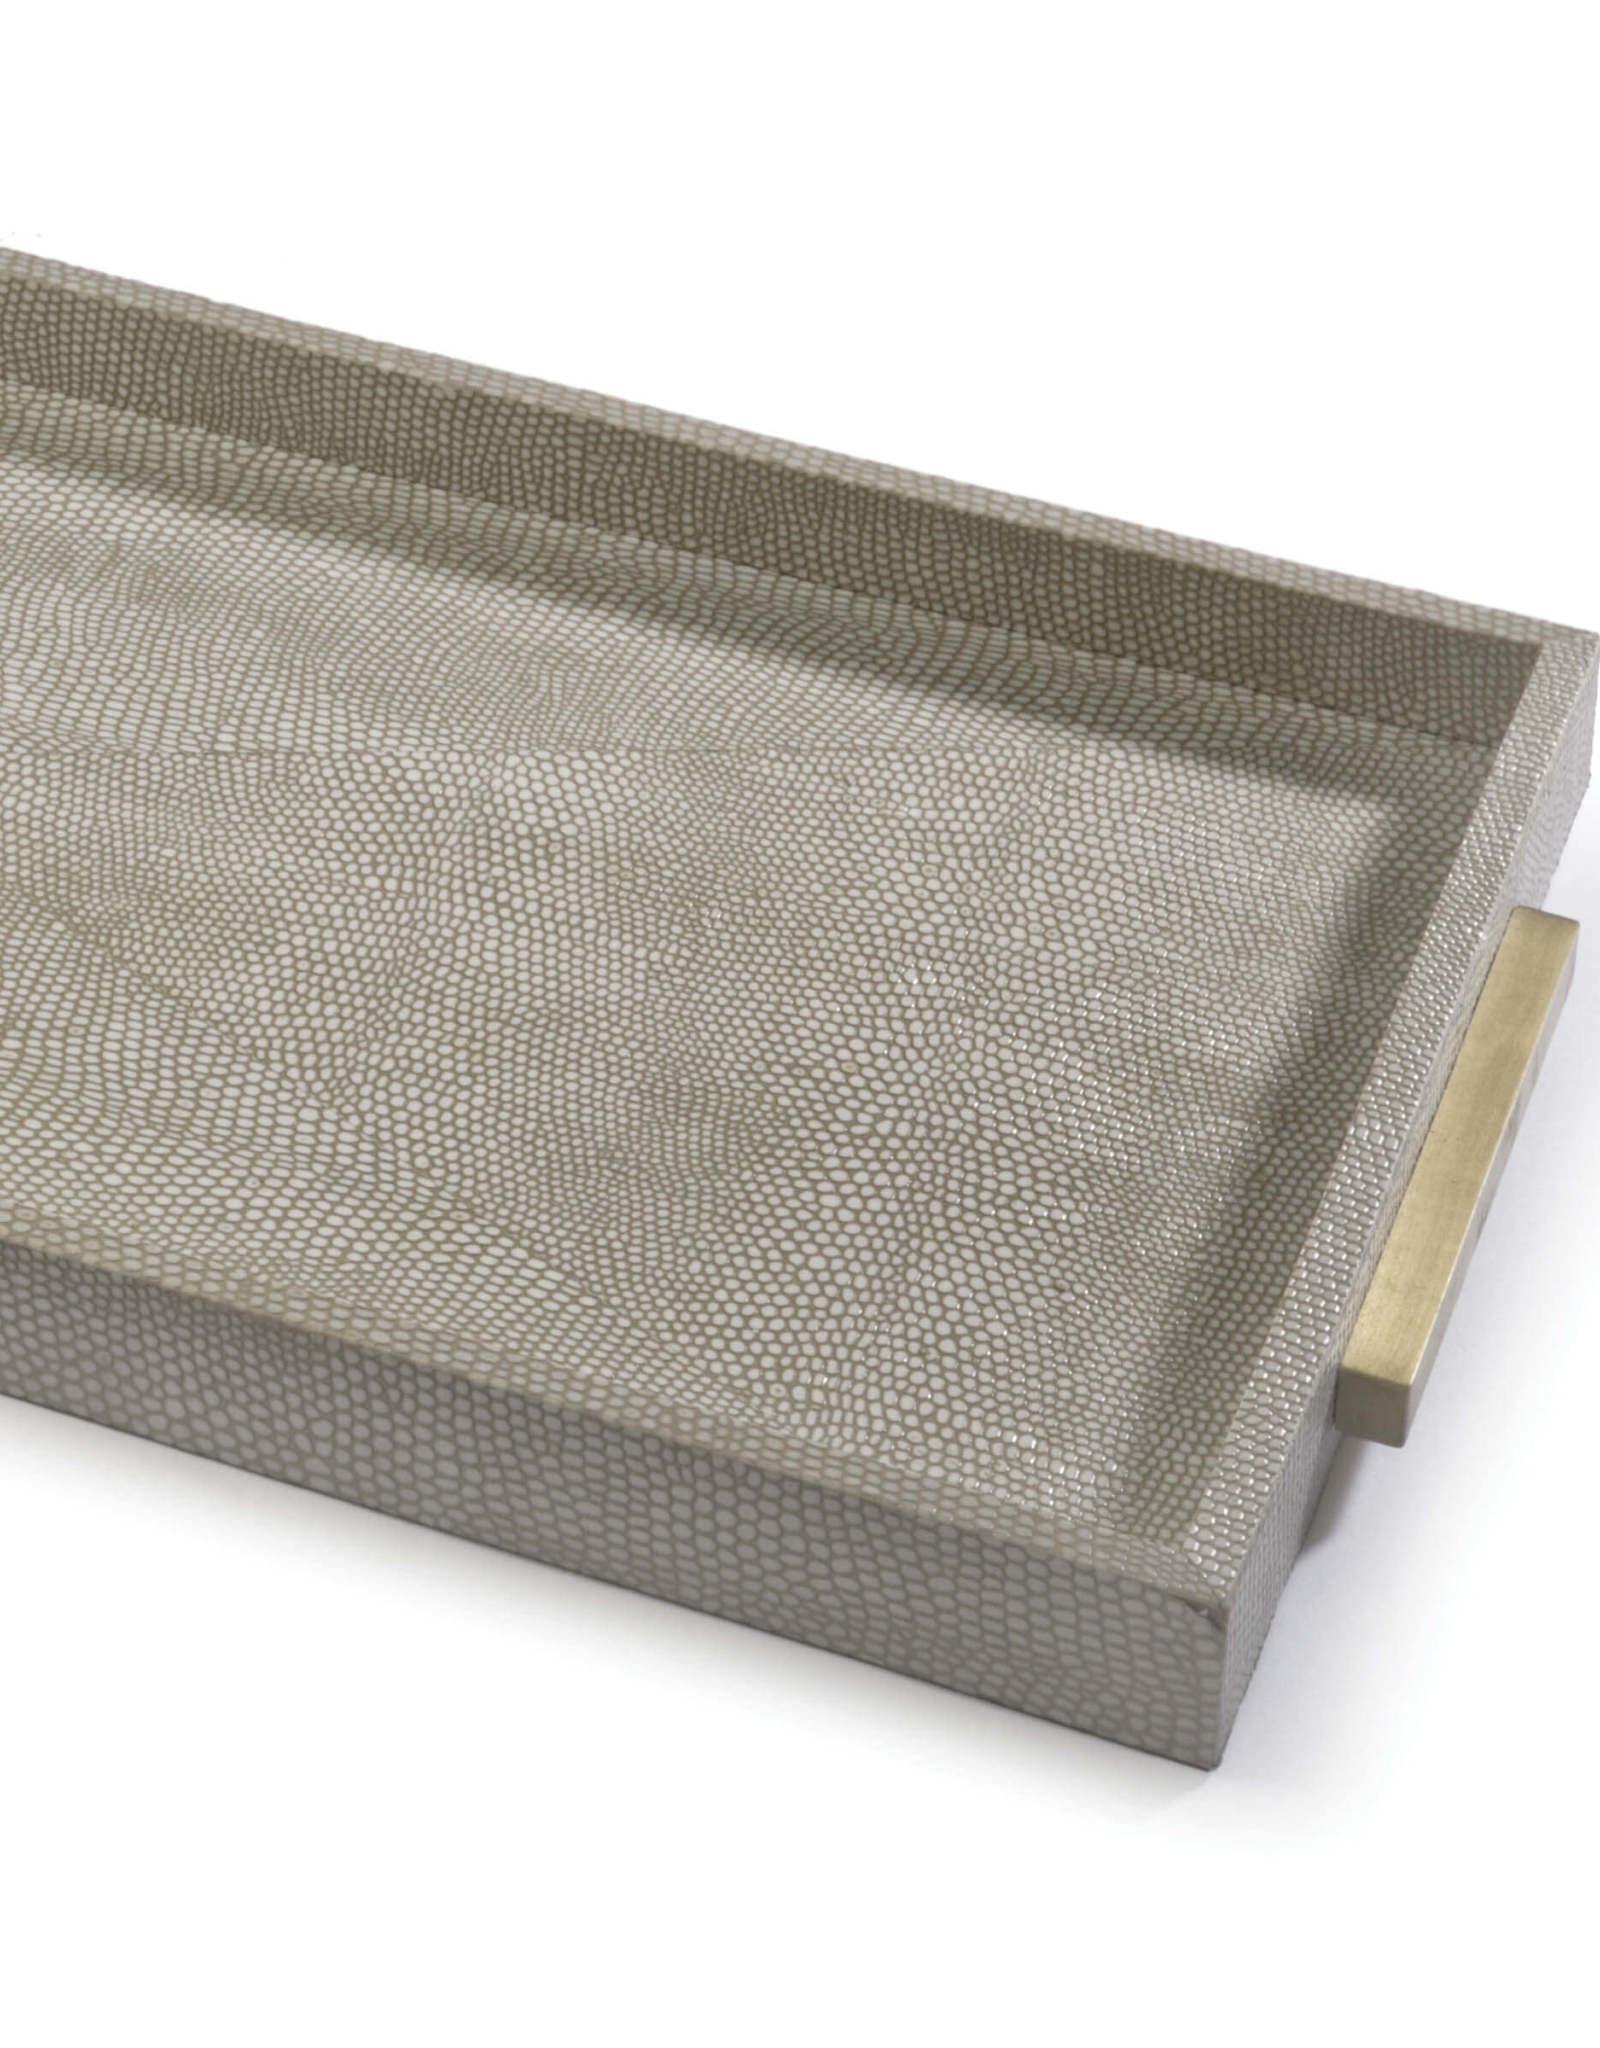 Regina Andrew Design Rectangle Shagreen Boutique Tray (Ivory Grey Python)